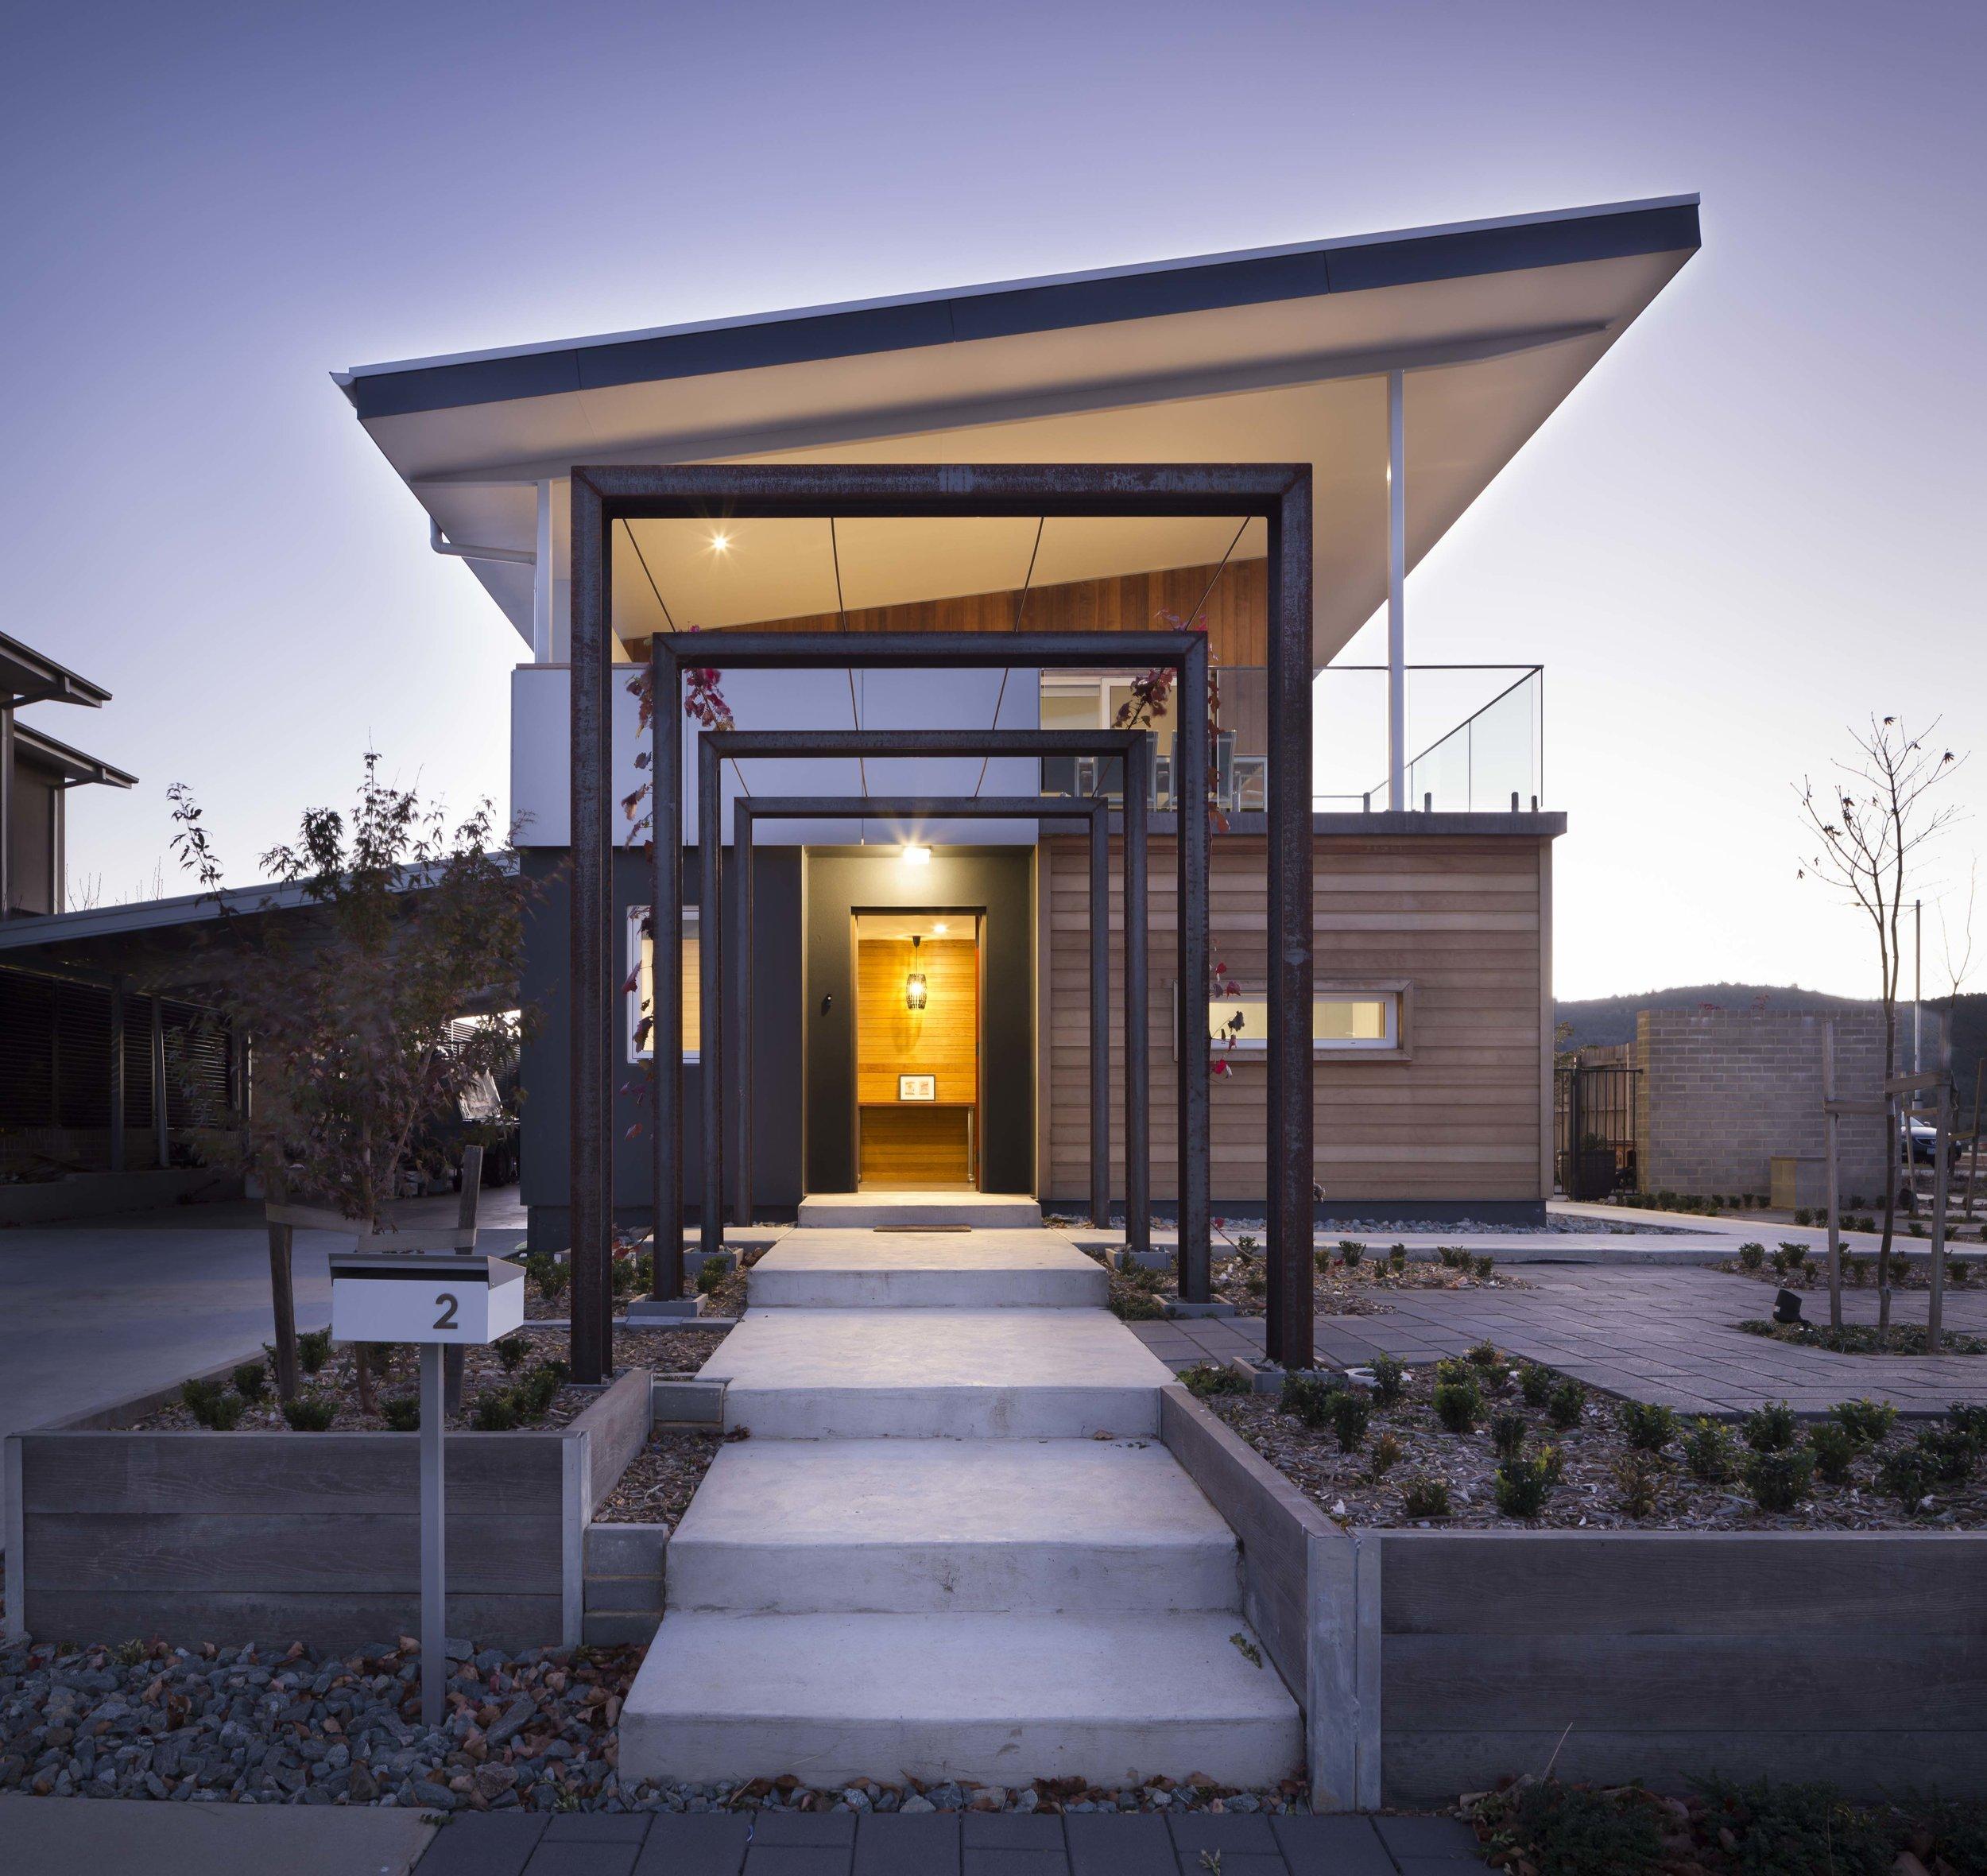 marina-mcdonald-architectural-photography-rogers-design-&-construction-exterior-entrance